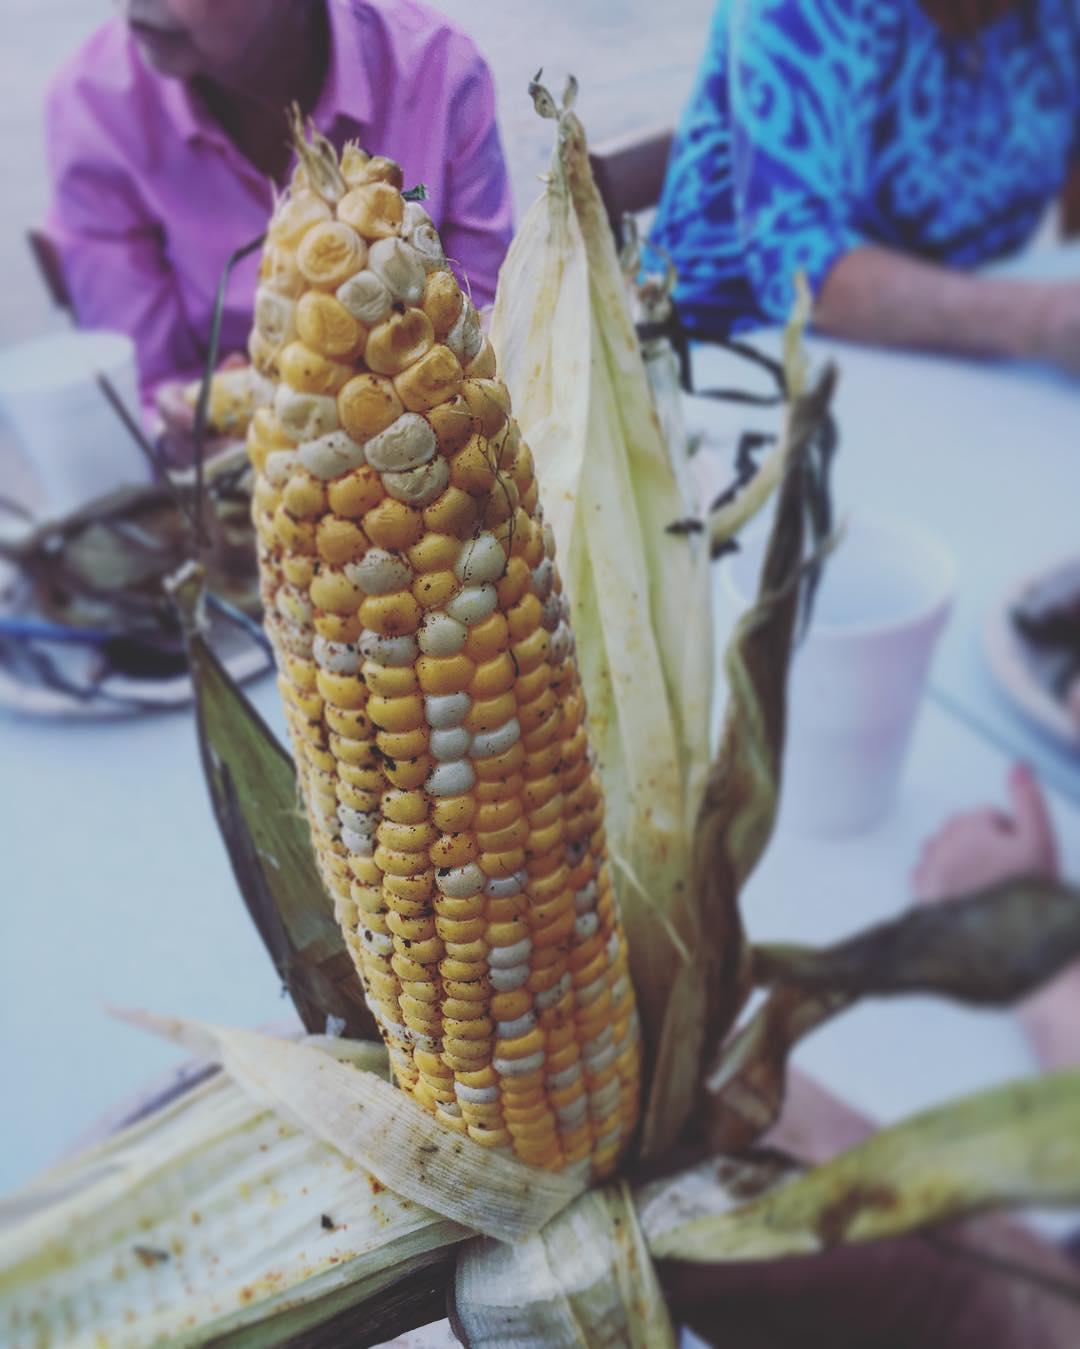 We smoked some corn. It rocked